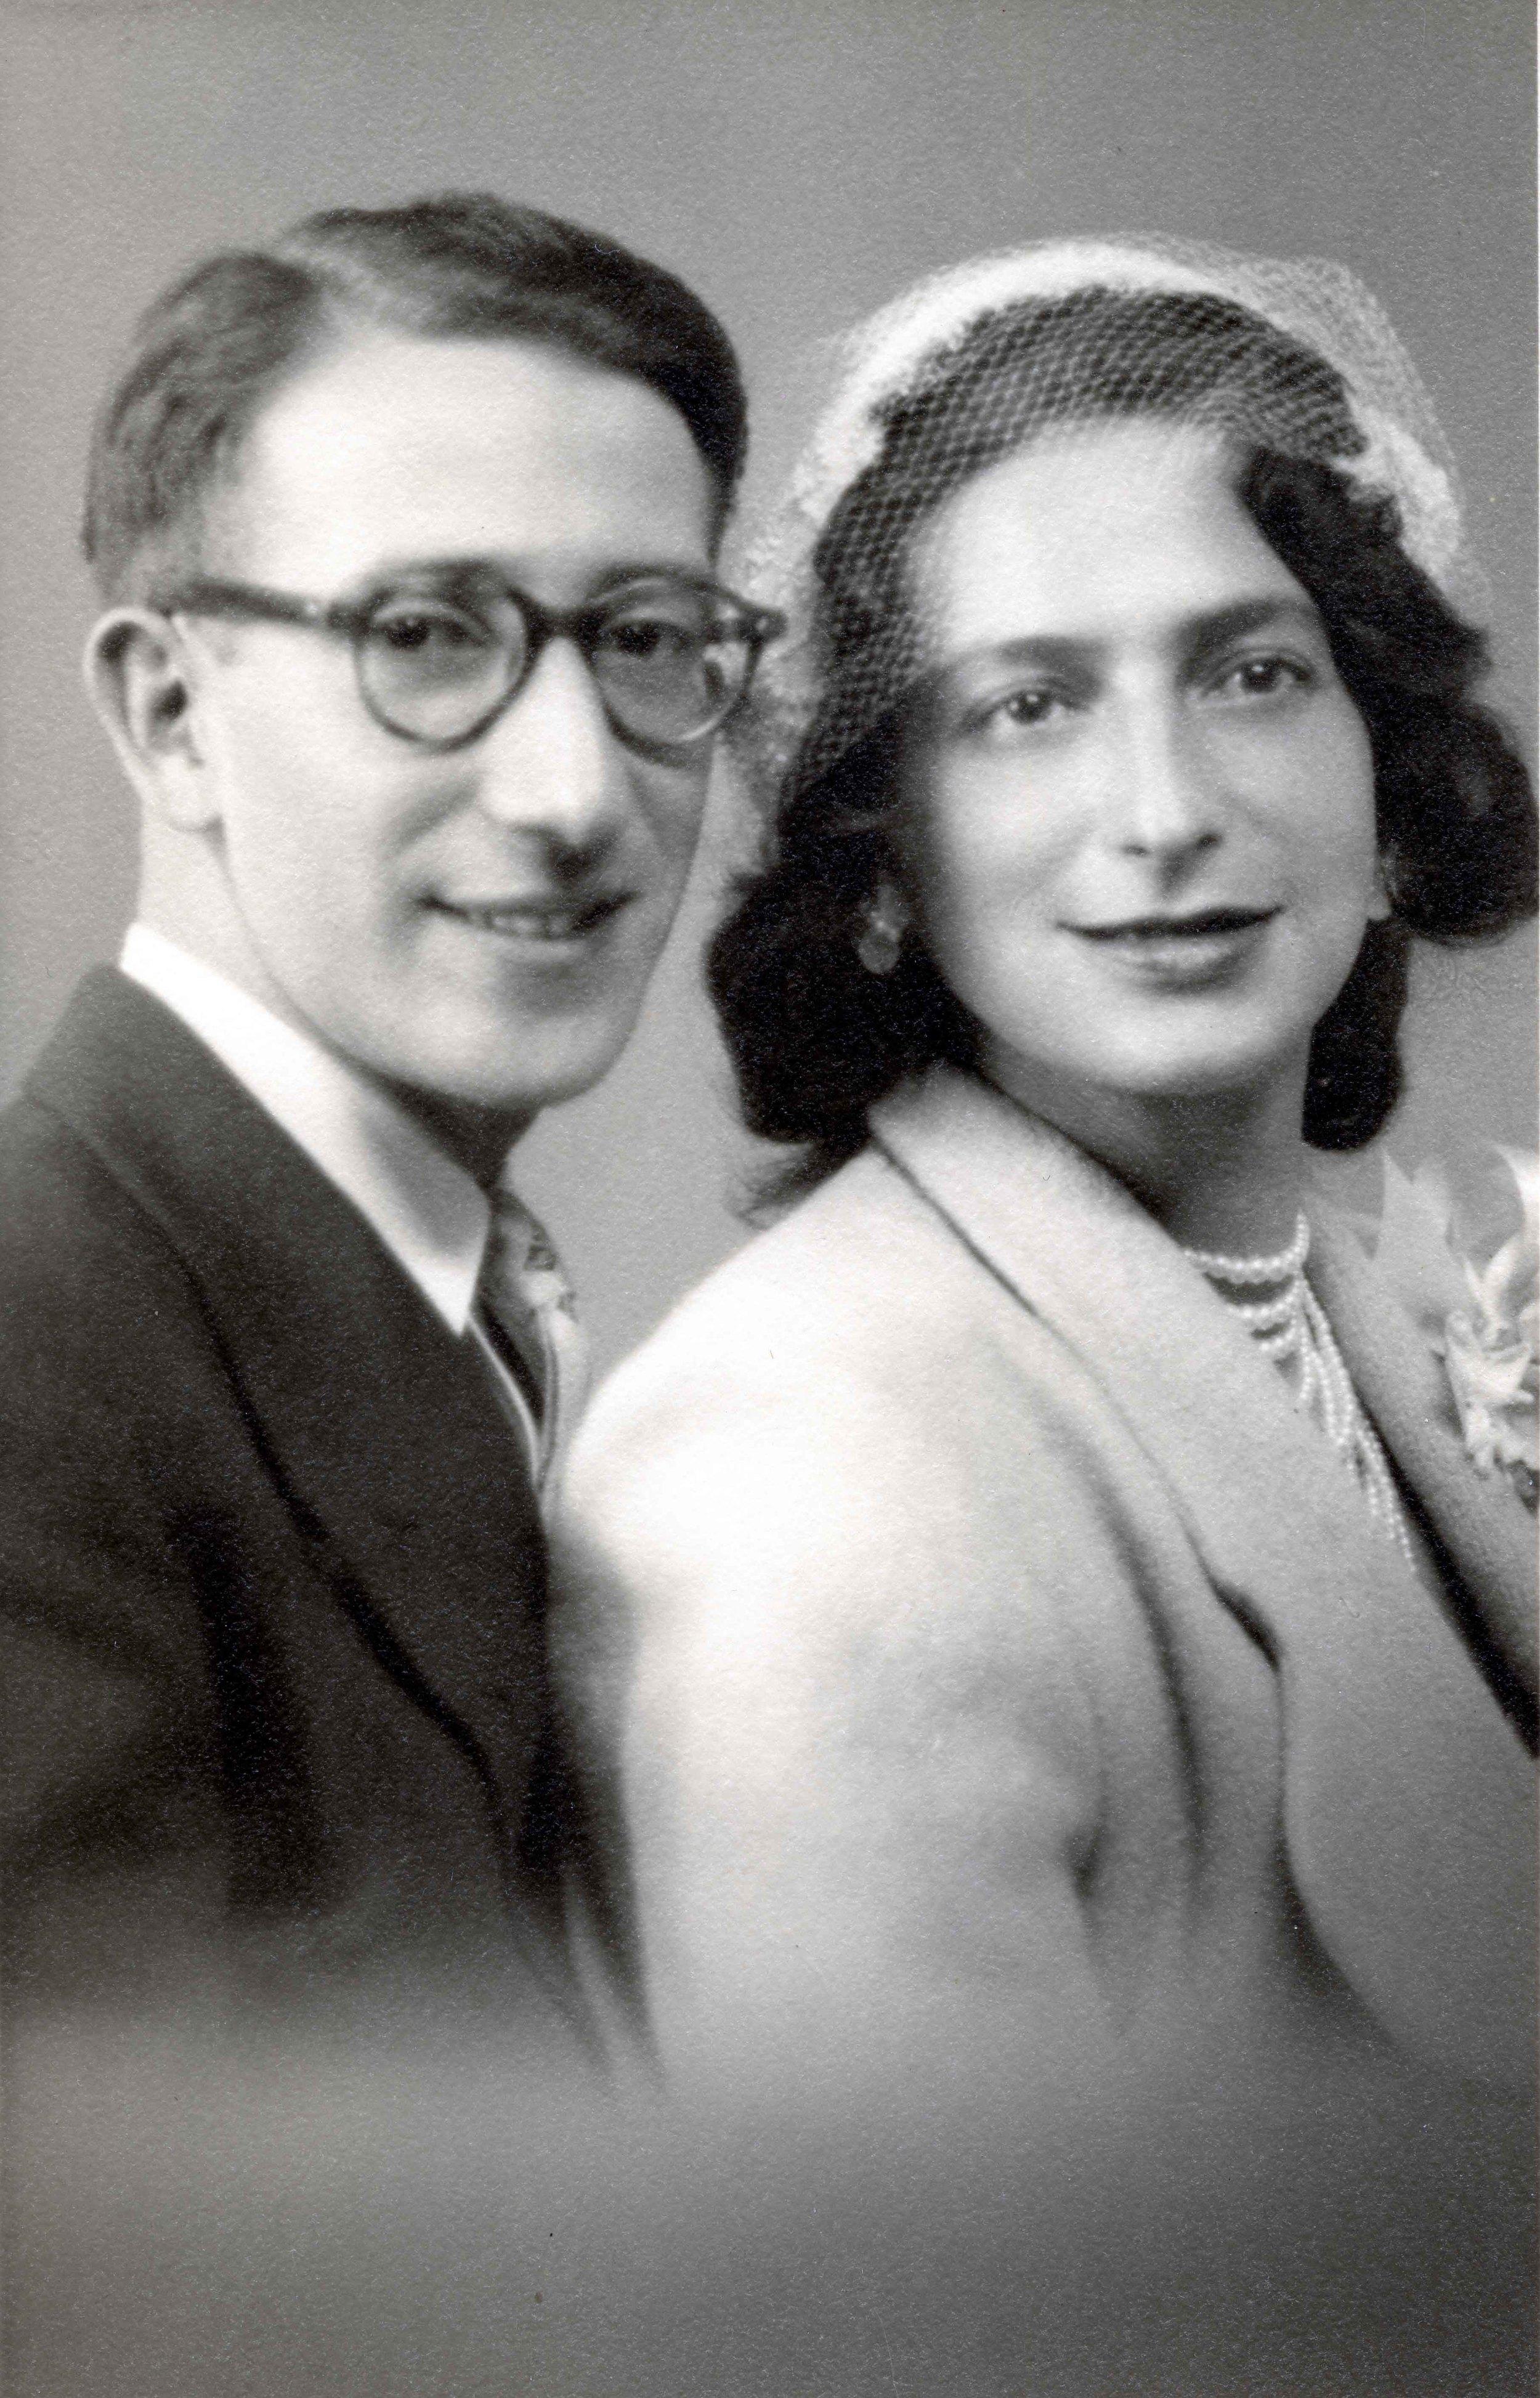 Hana & Ralph on their wedding day / October 1952